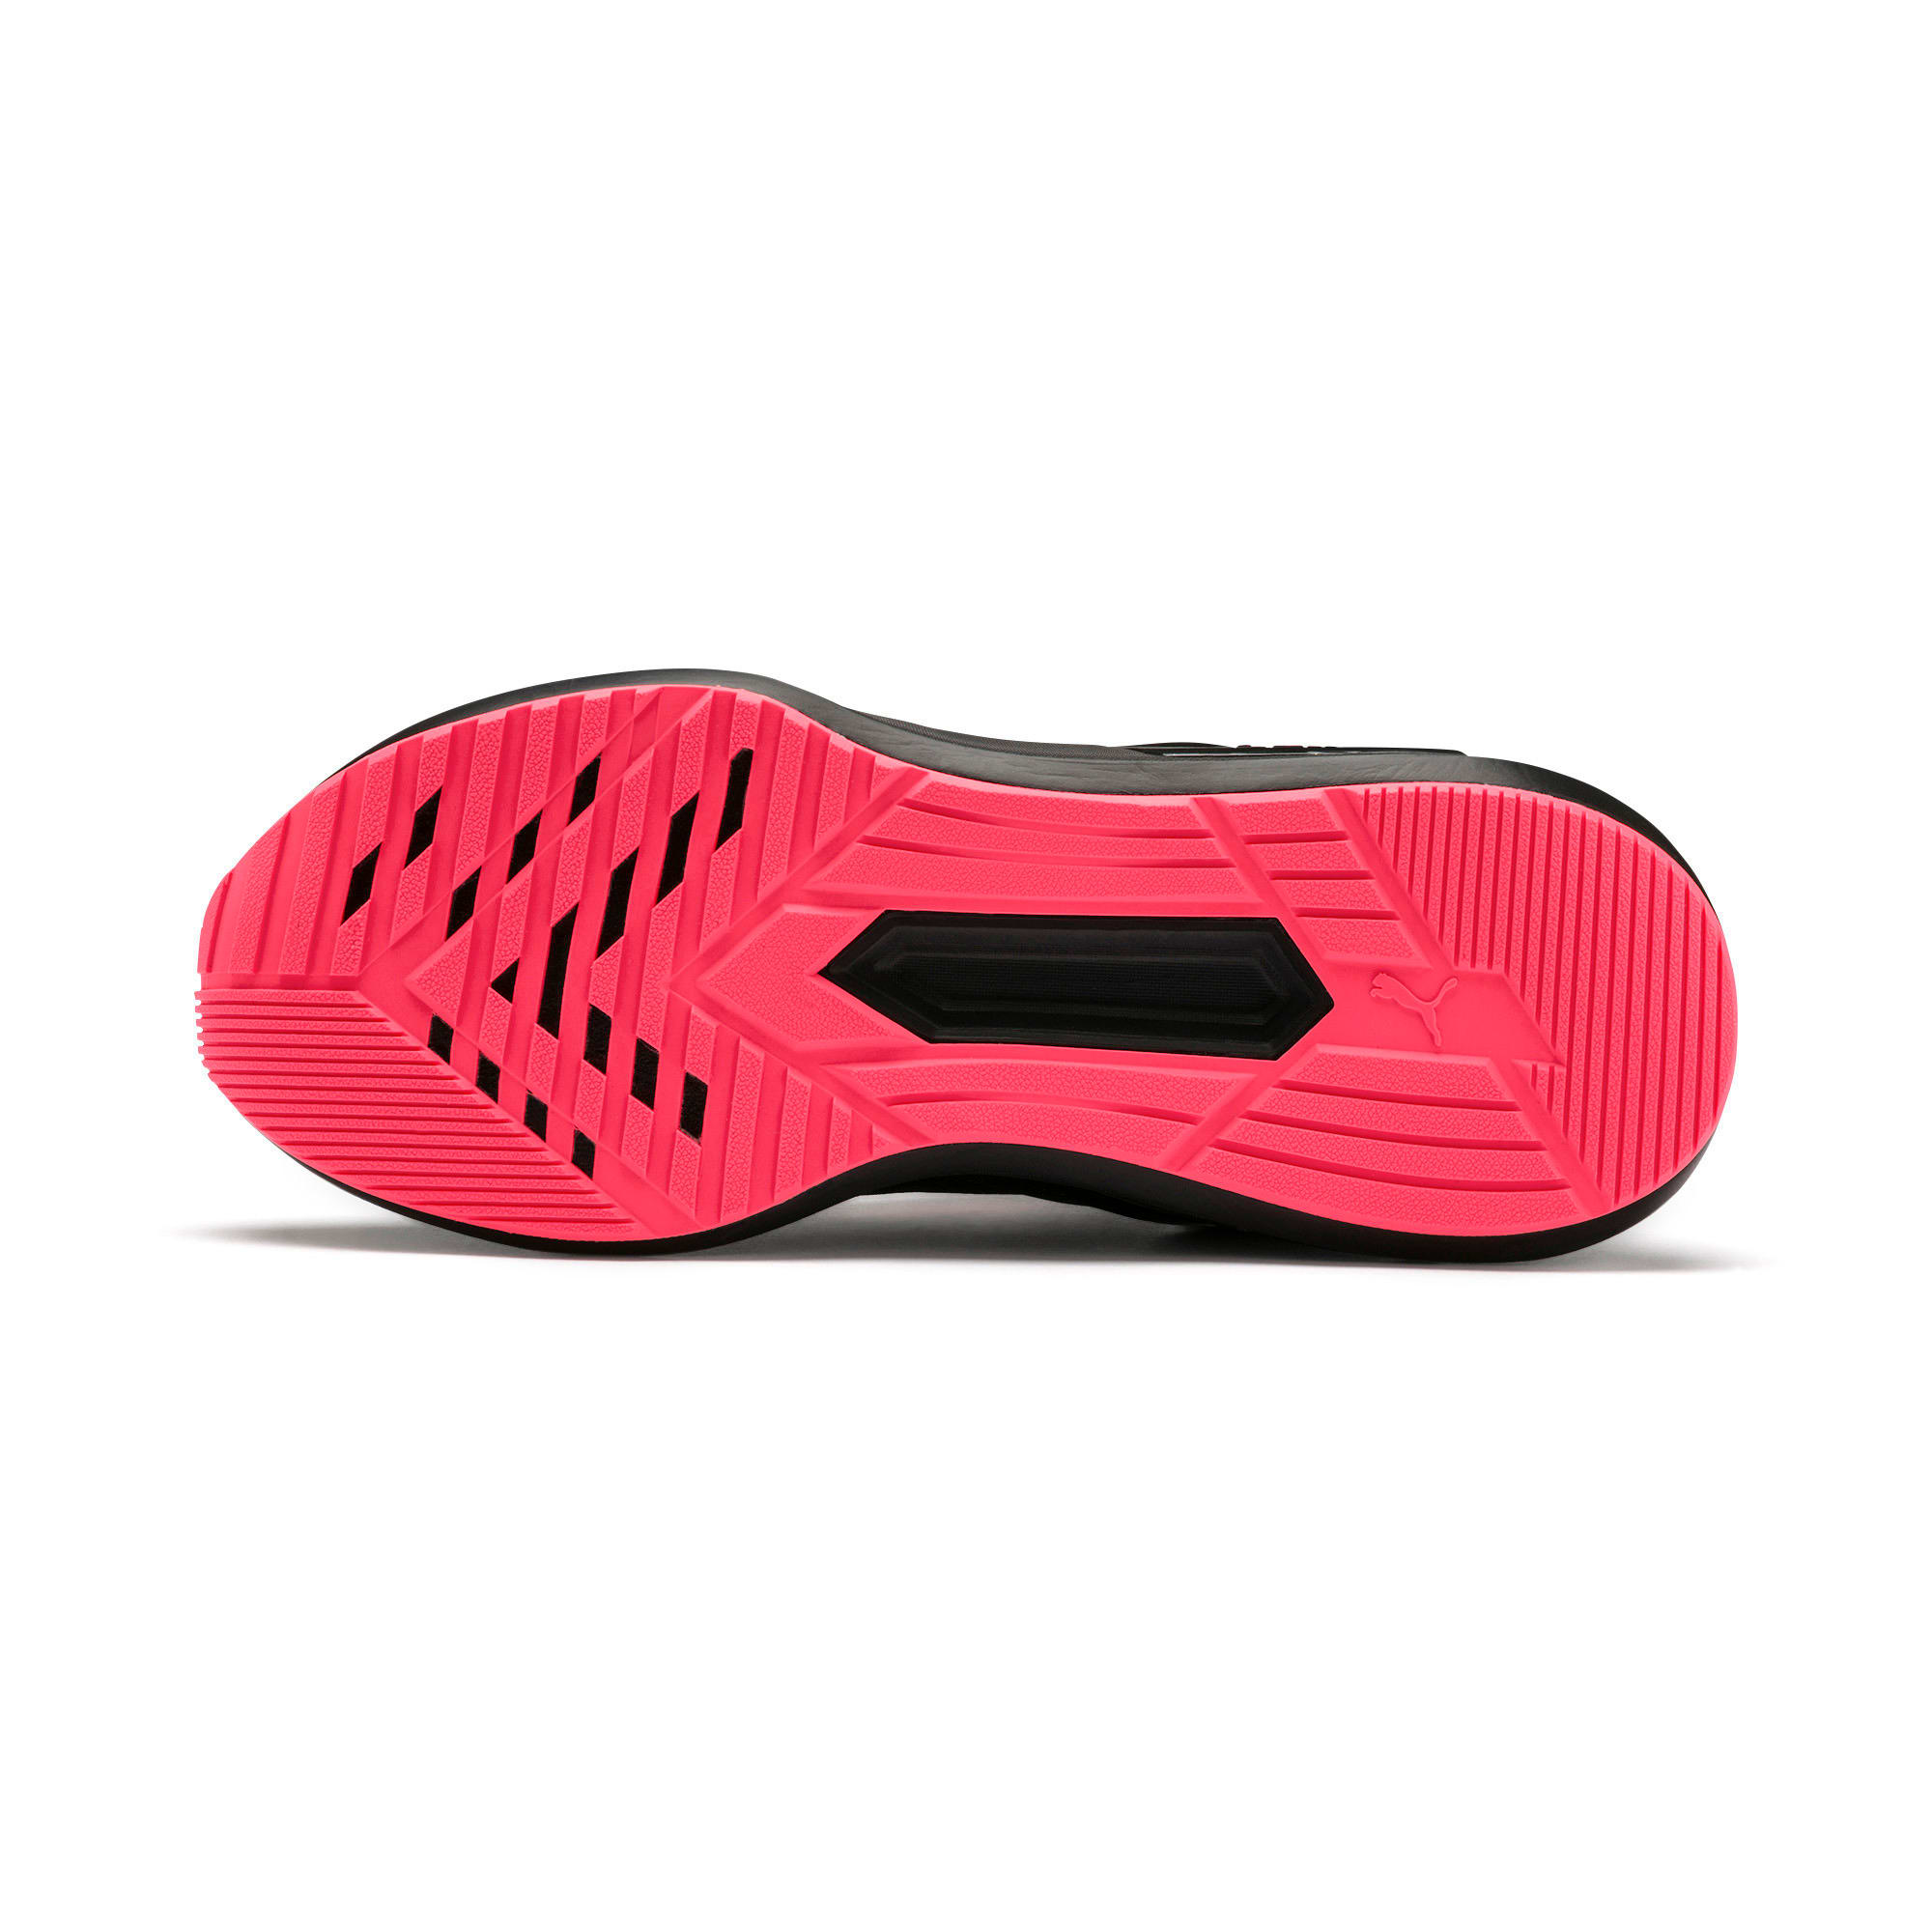 Thumbnail 6 of Rogue X Knit Women's Running Shoes, Puma Black-Pink Alert, medium-IND